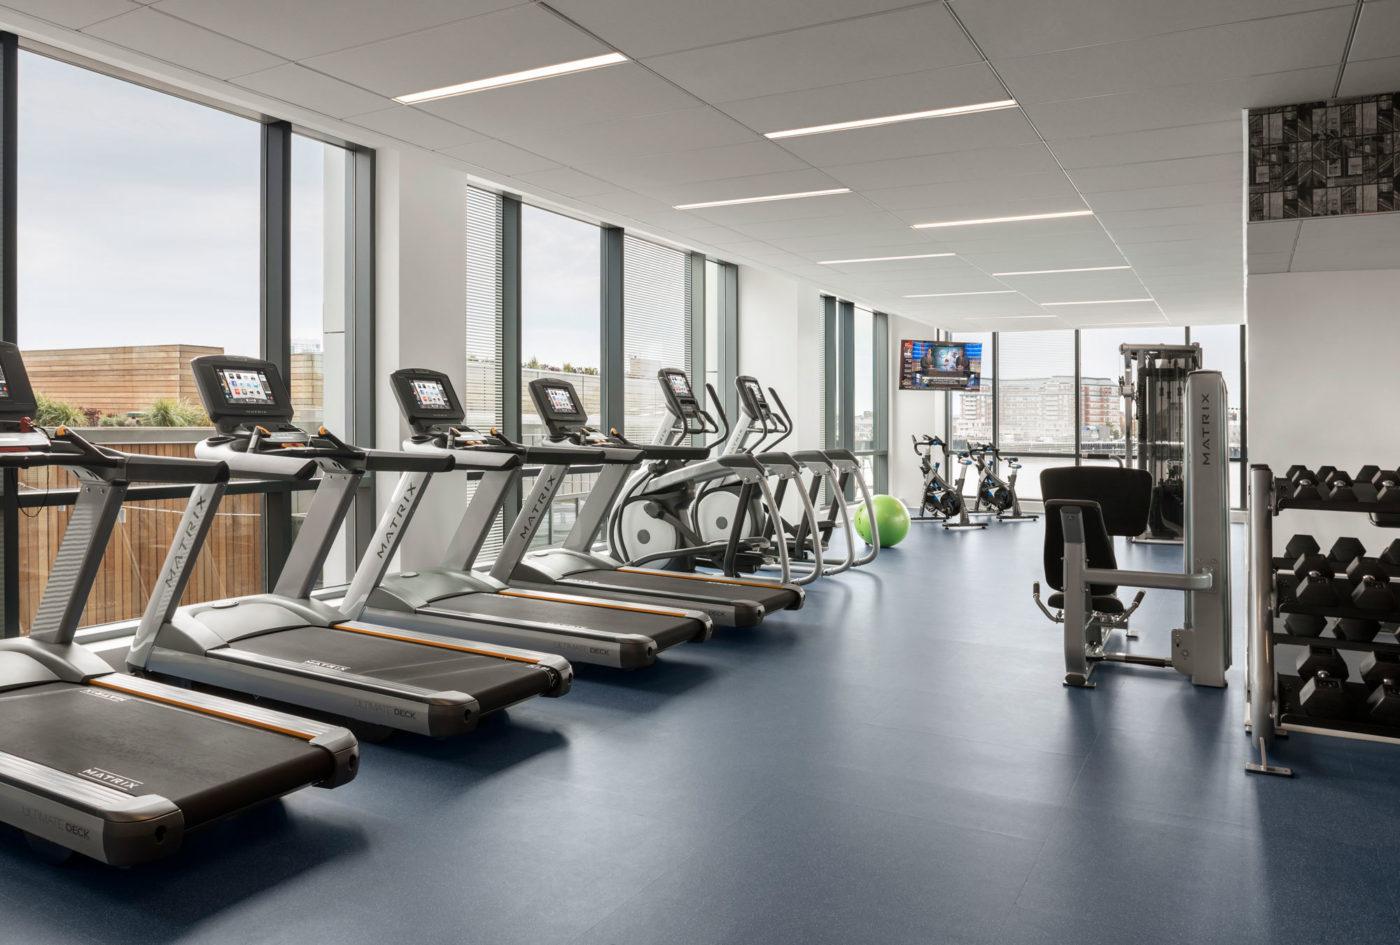 Eddy fitness room